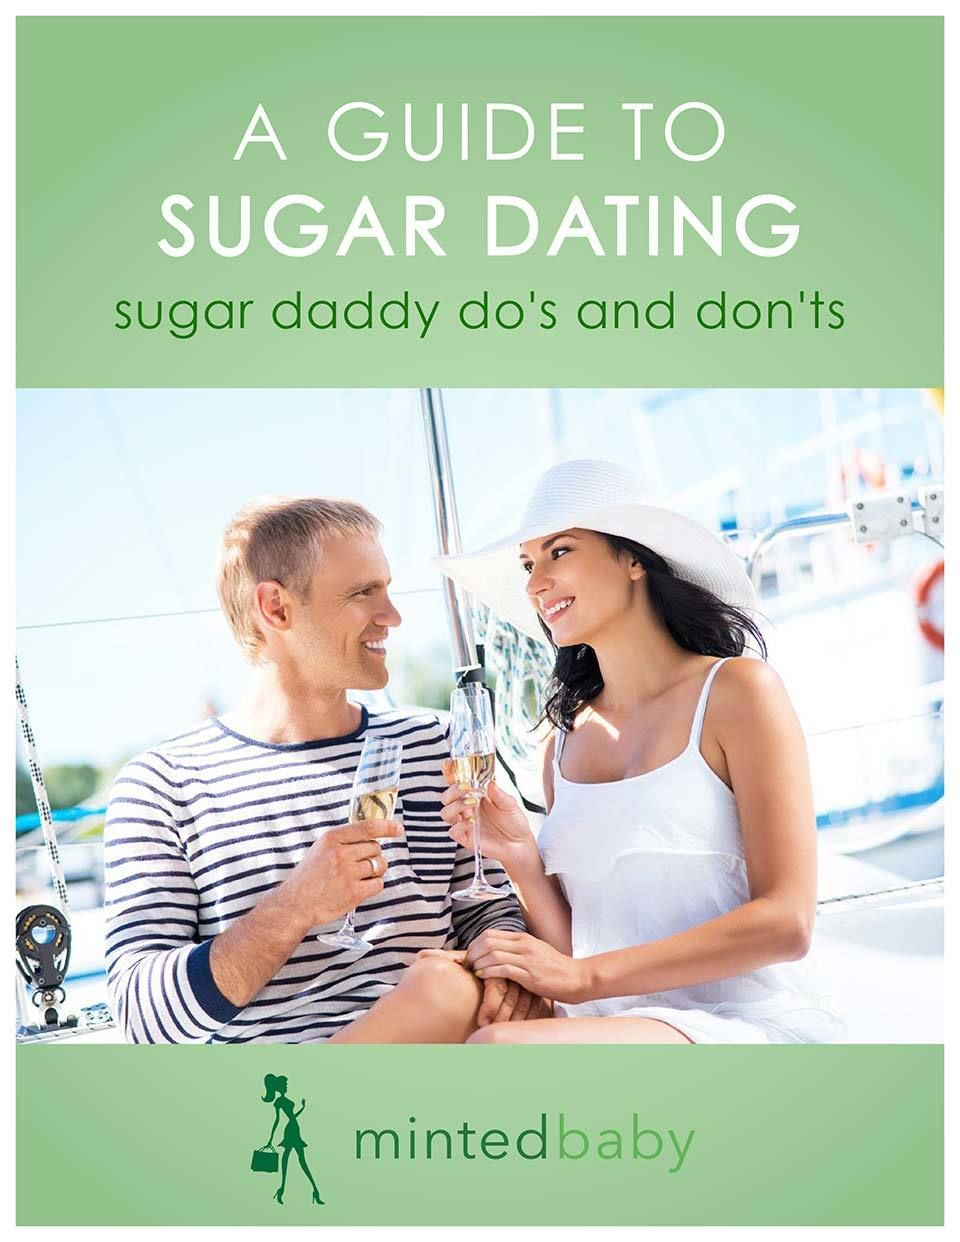 is stassi dating patrick